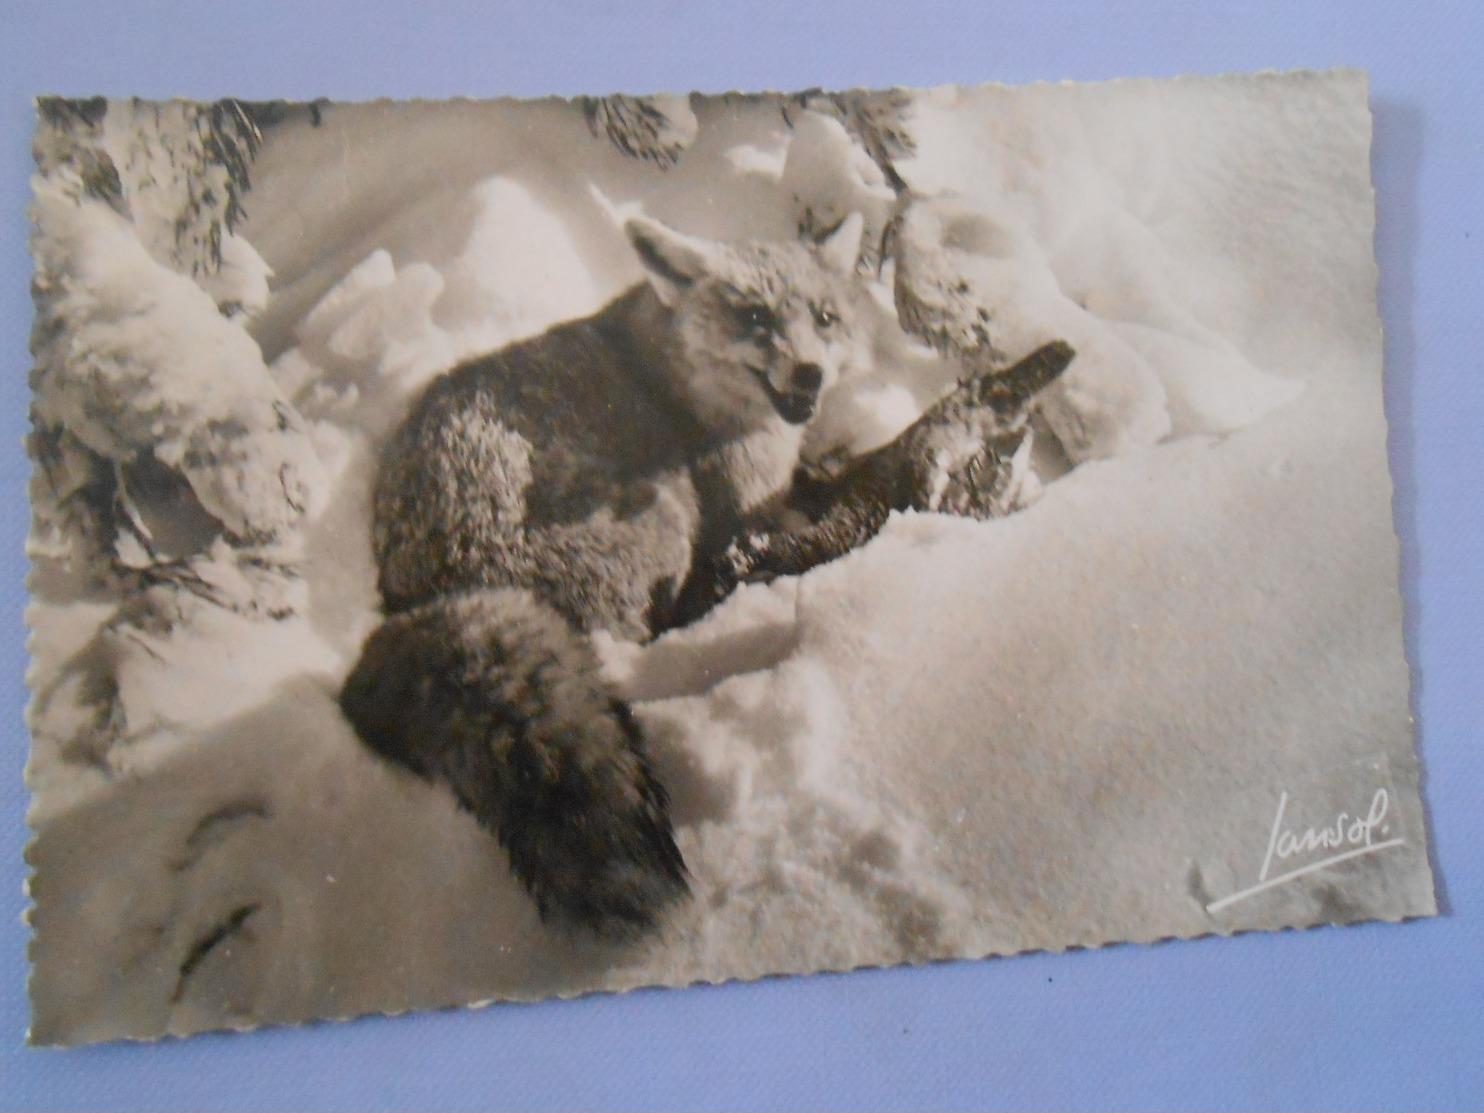 Cpsm- Fantaisie ; Carte-postale-----Postcard---RENARD--/A11/ - Animaux & Faune